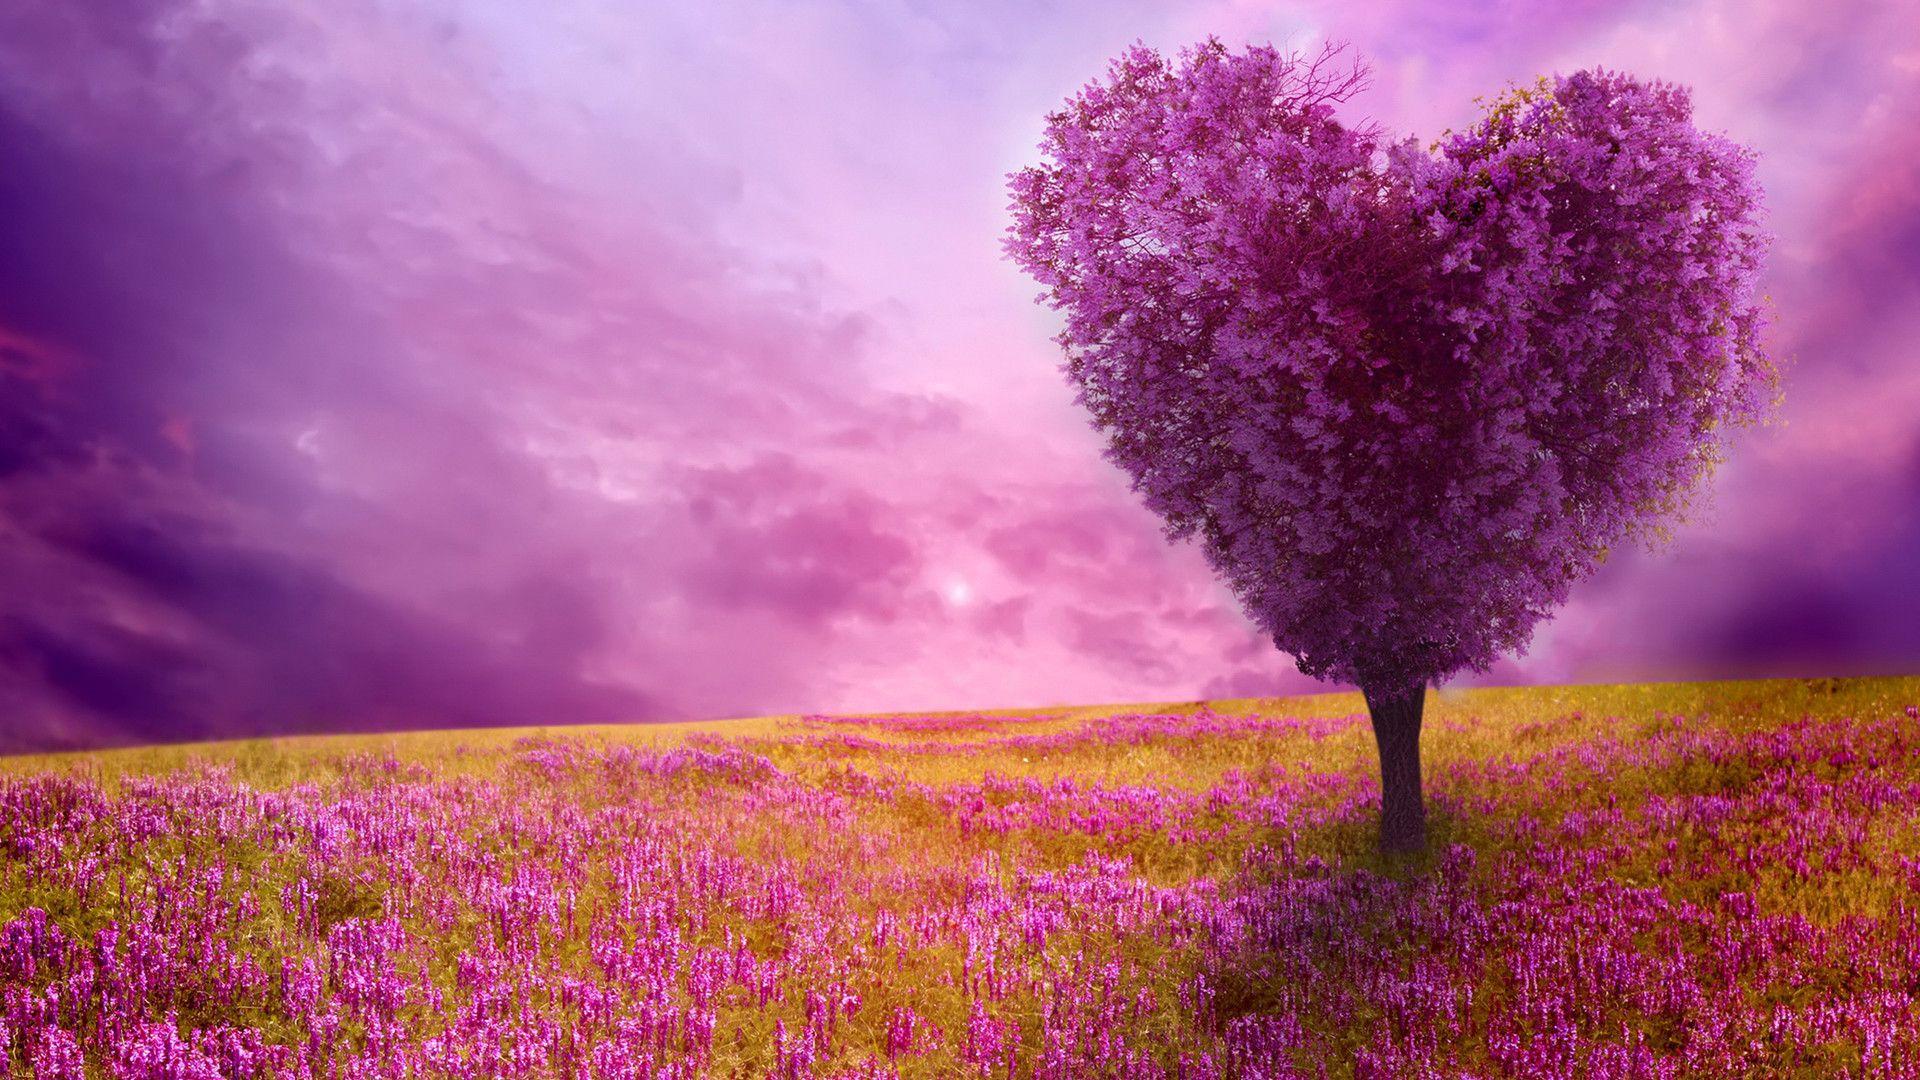 Fantastic Purple Love Tree Heart Shape Beautiful Flowers And Plants Wallpapers Hd Wallpaper Downloa Spring Desktop Wallpaper Spring Wallpaper Spring Images